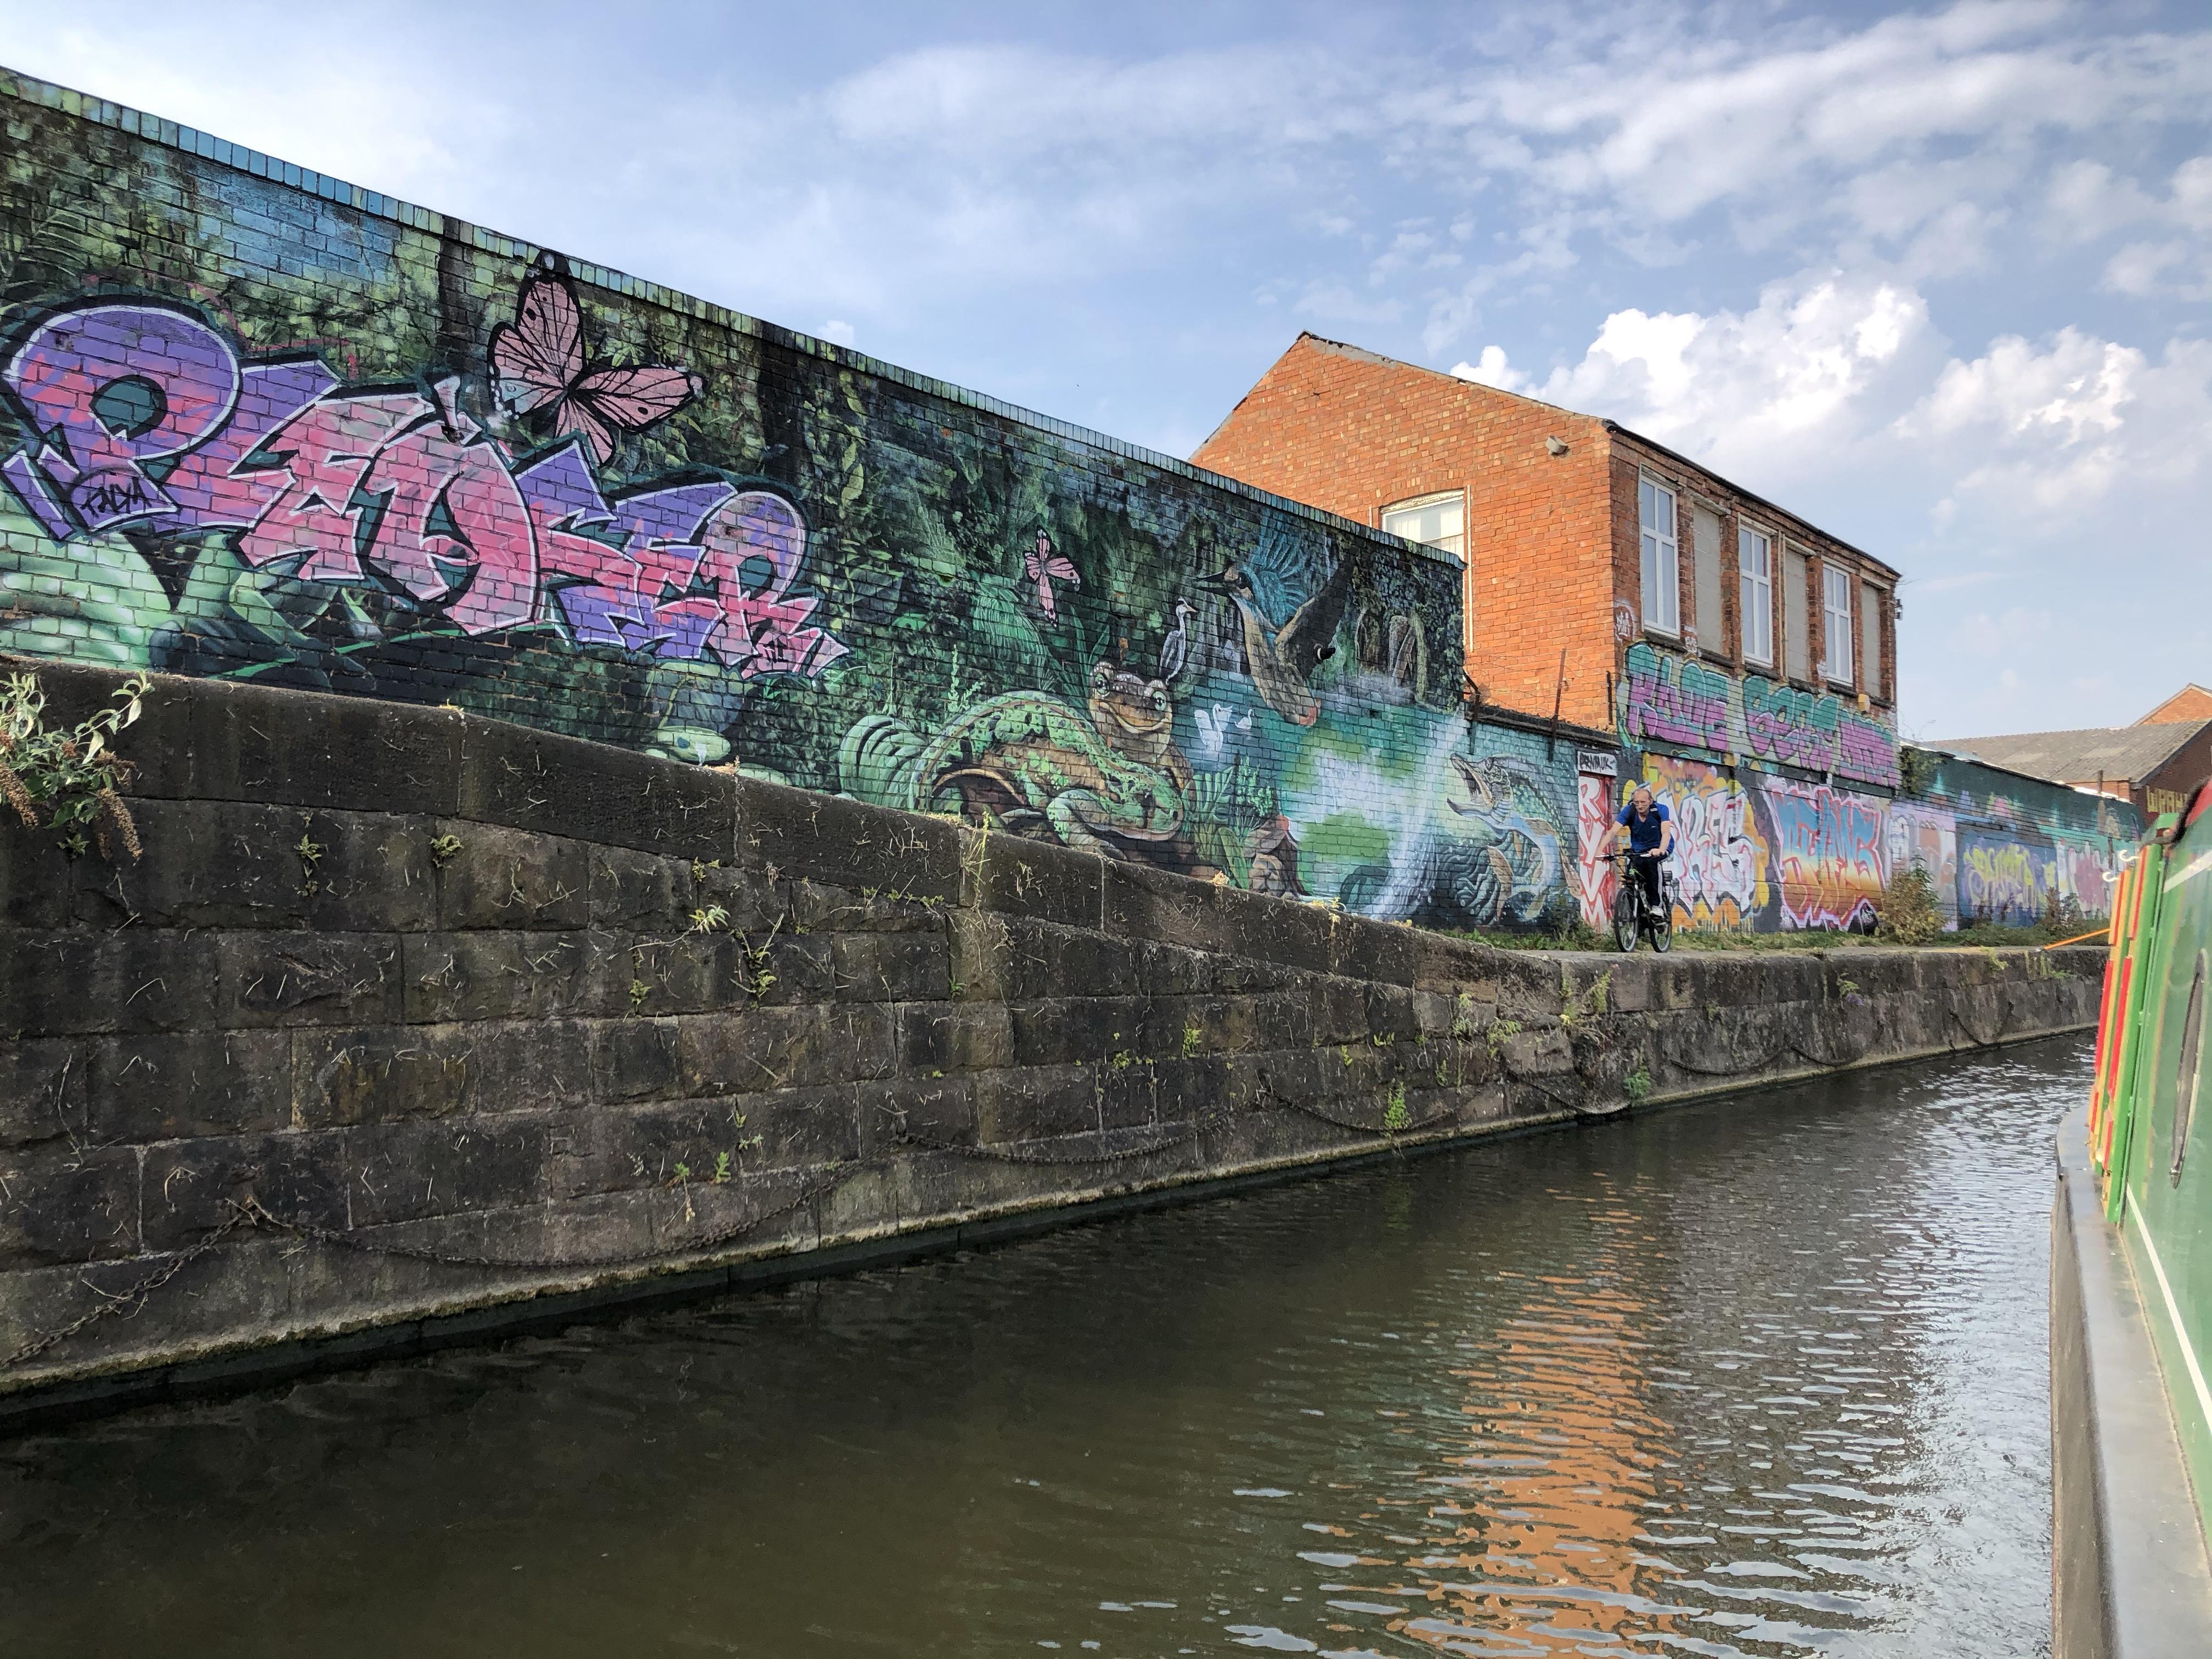 Leicester Graffiti August 2020